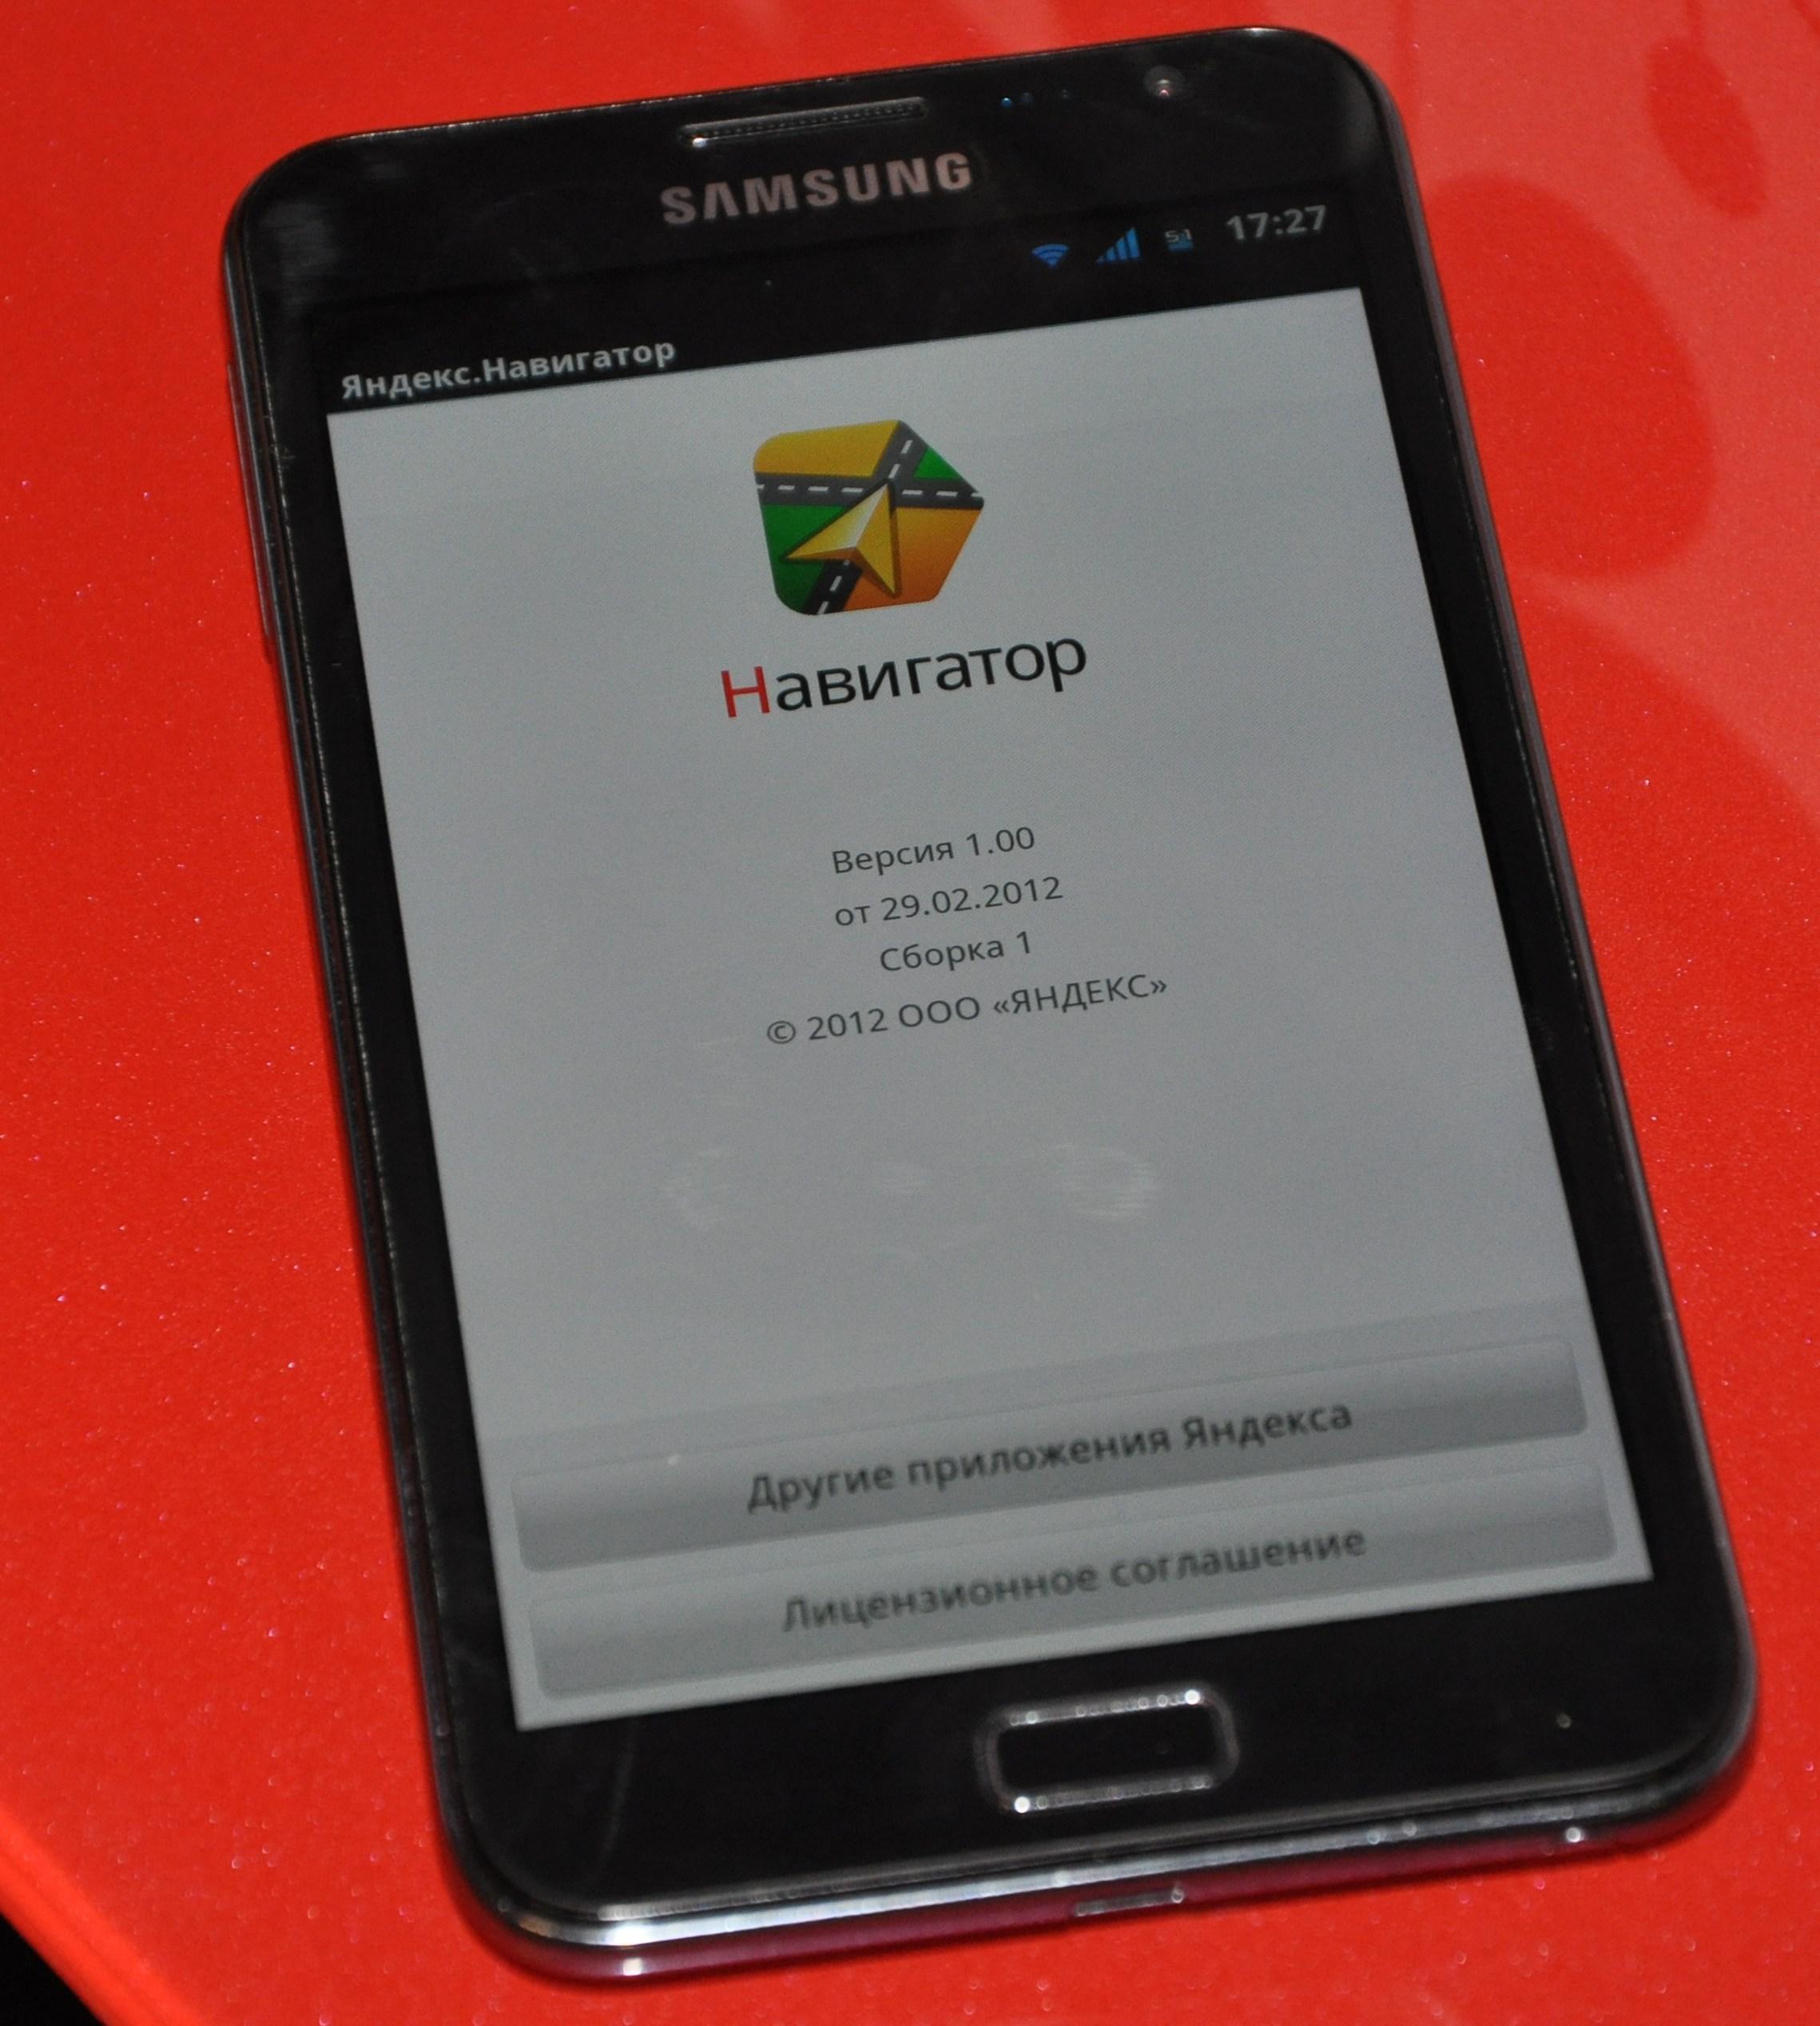 yandex_navigator_ Samsung_Galaxy_Note